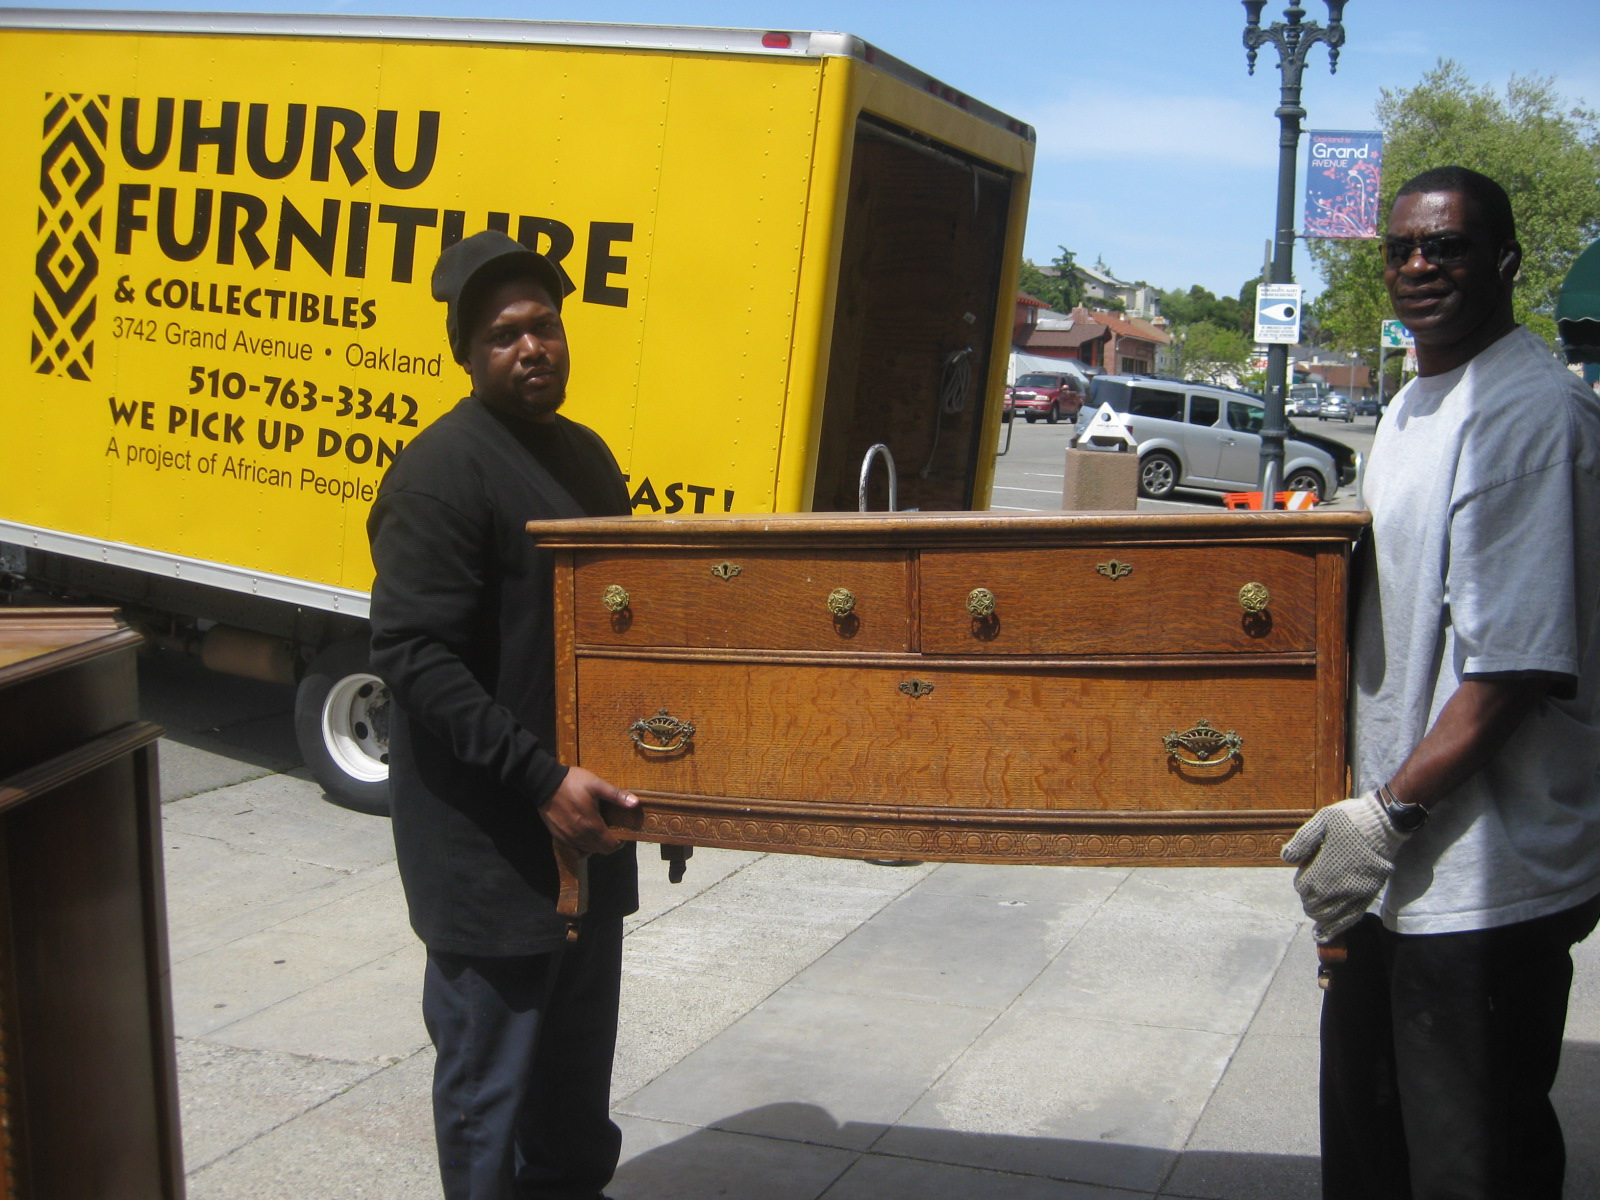 Marvelous Donate Furniture